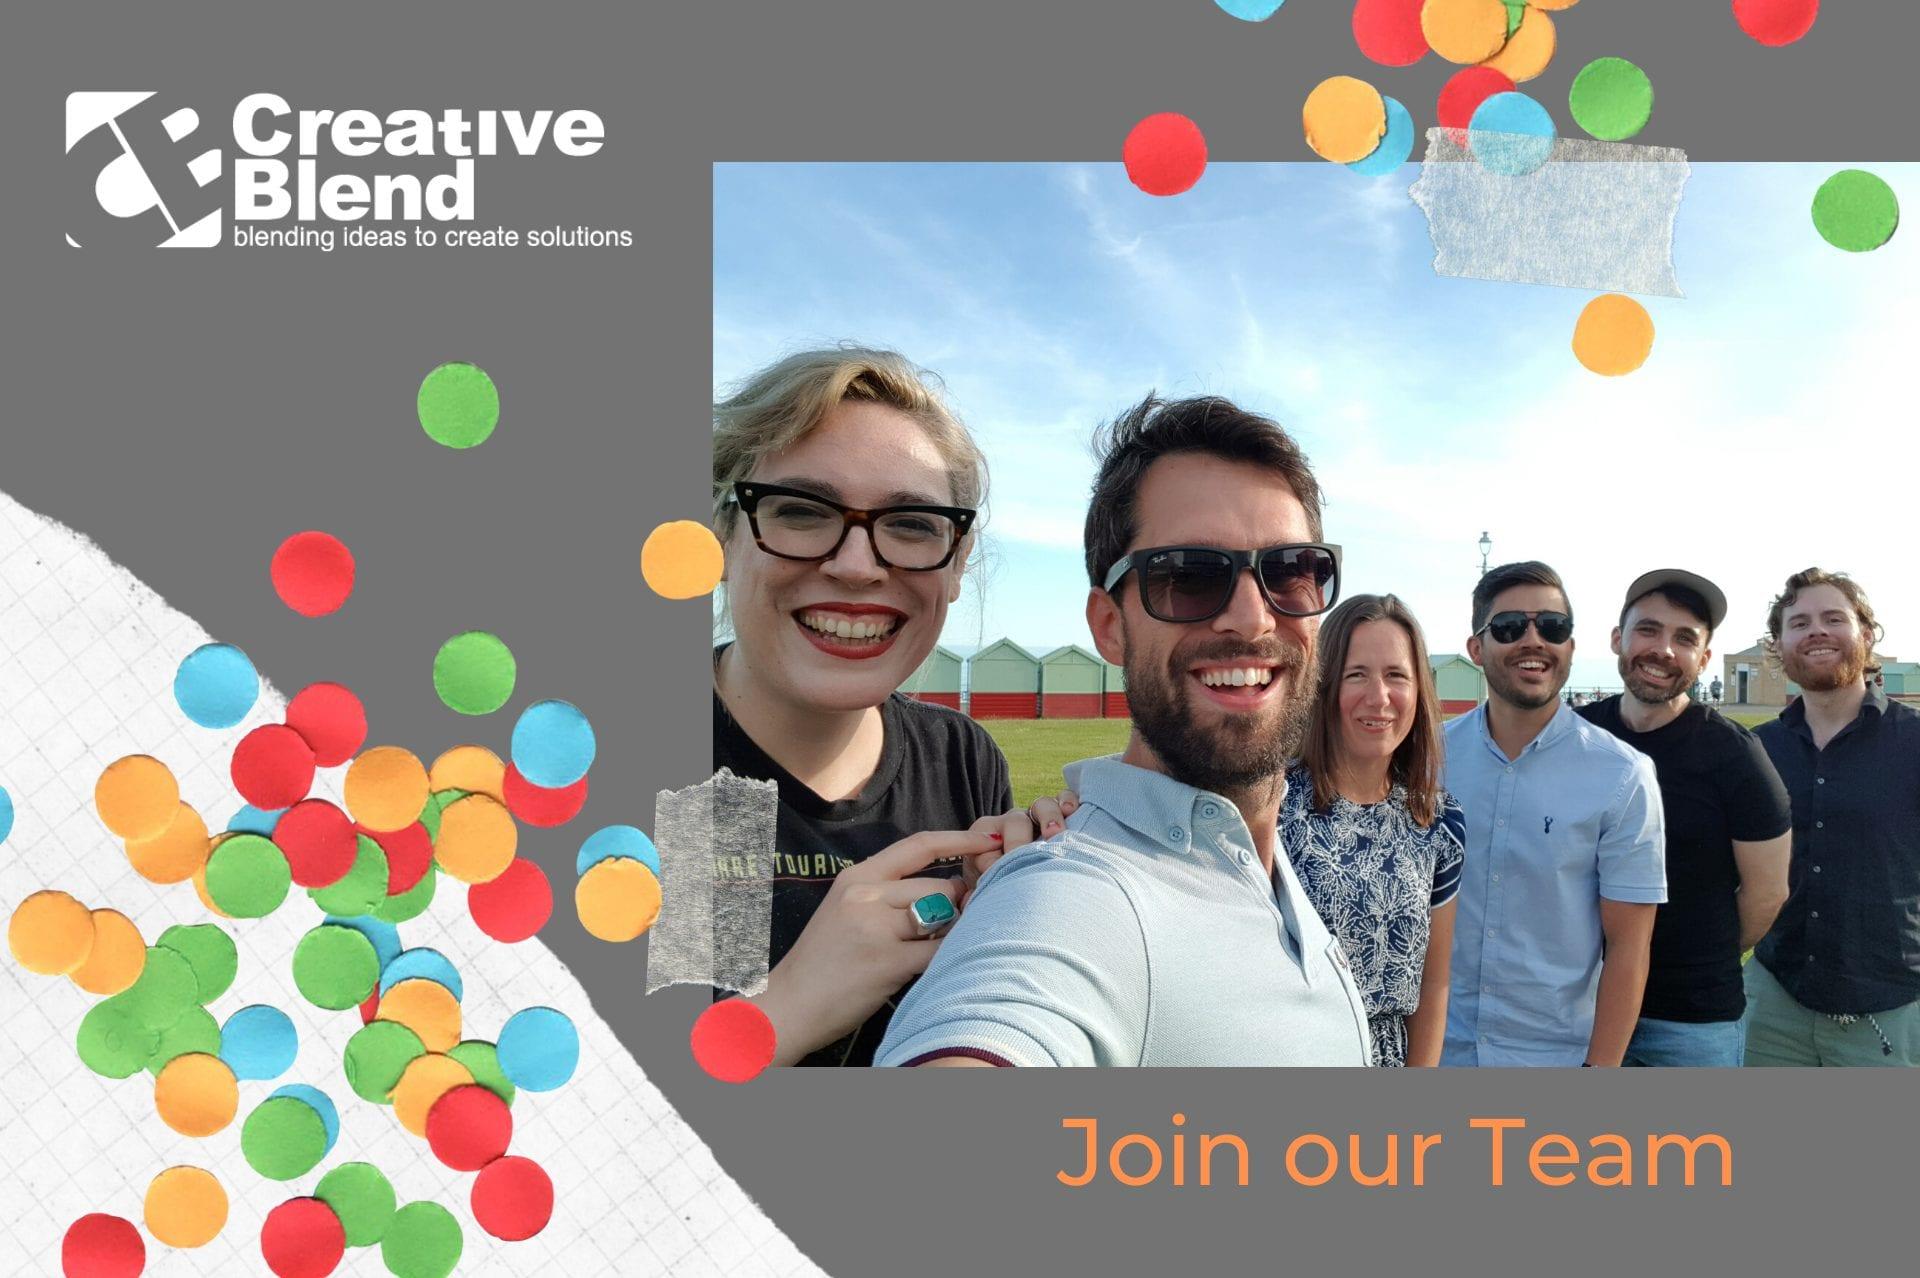 Creative Blend flyer